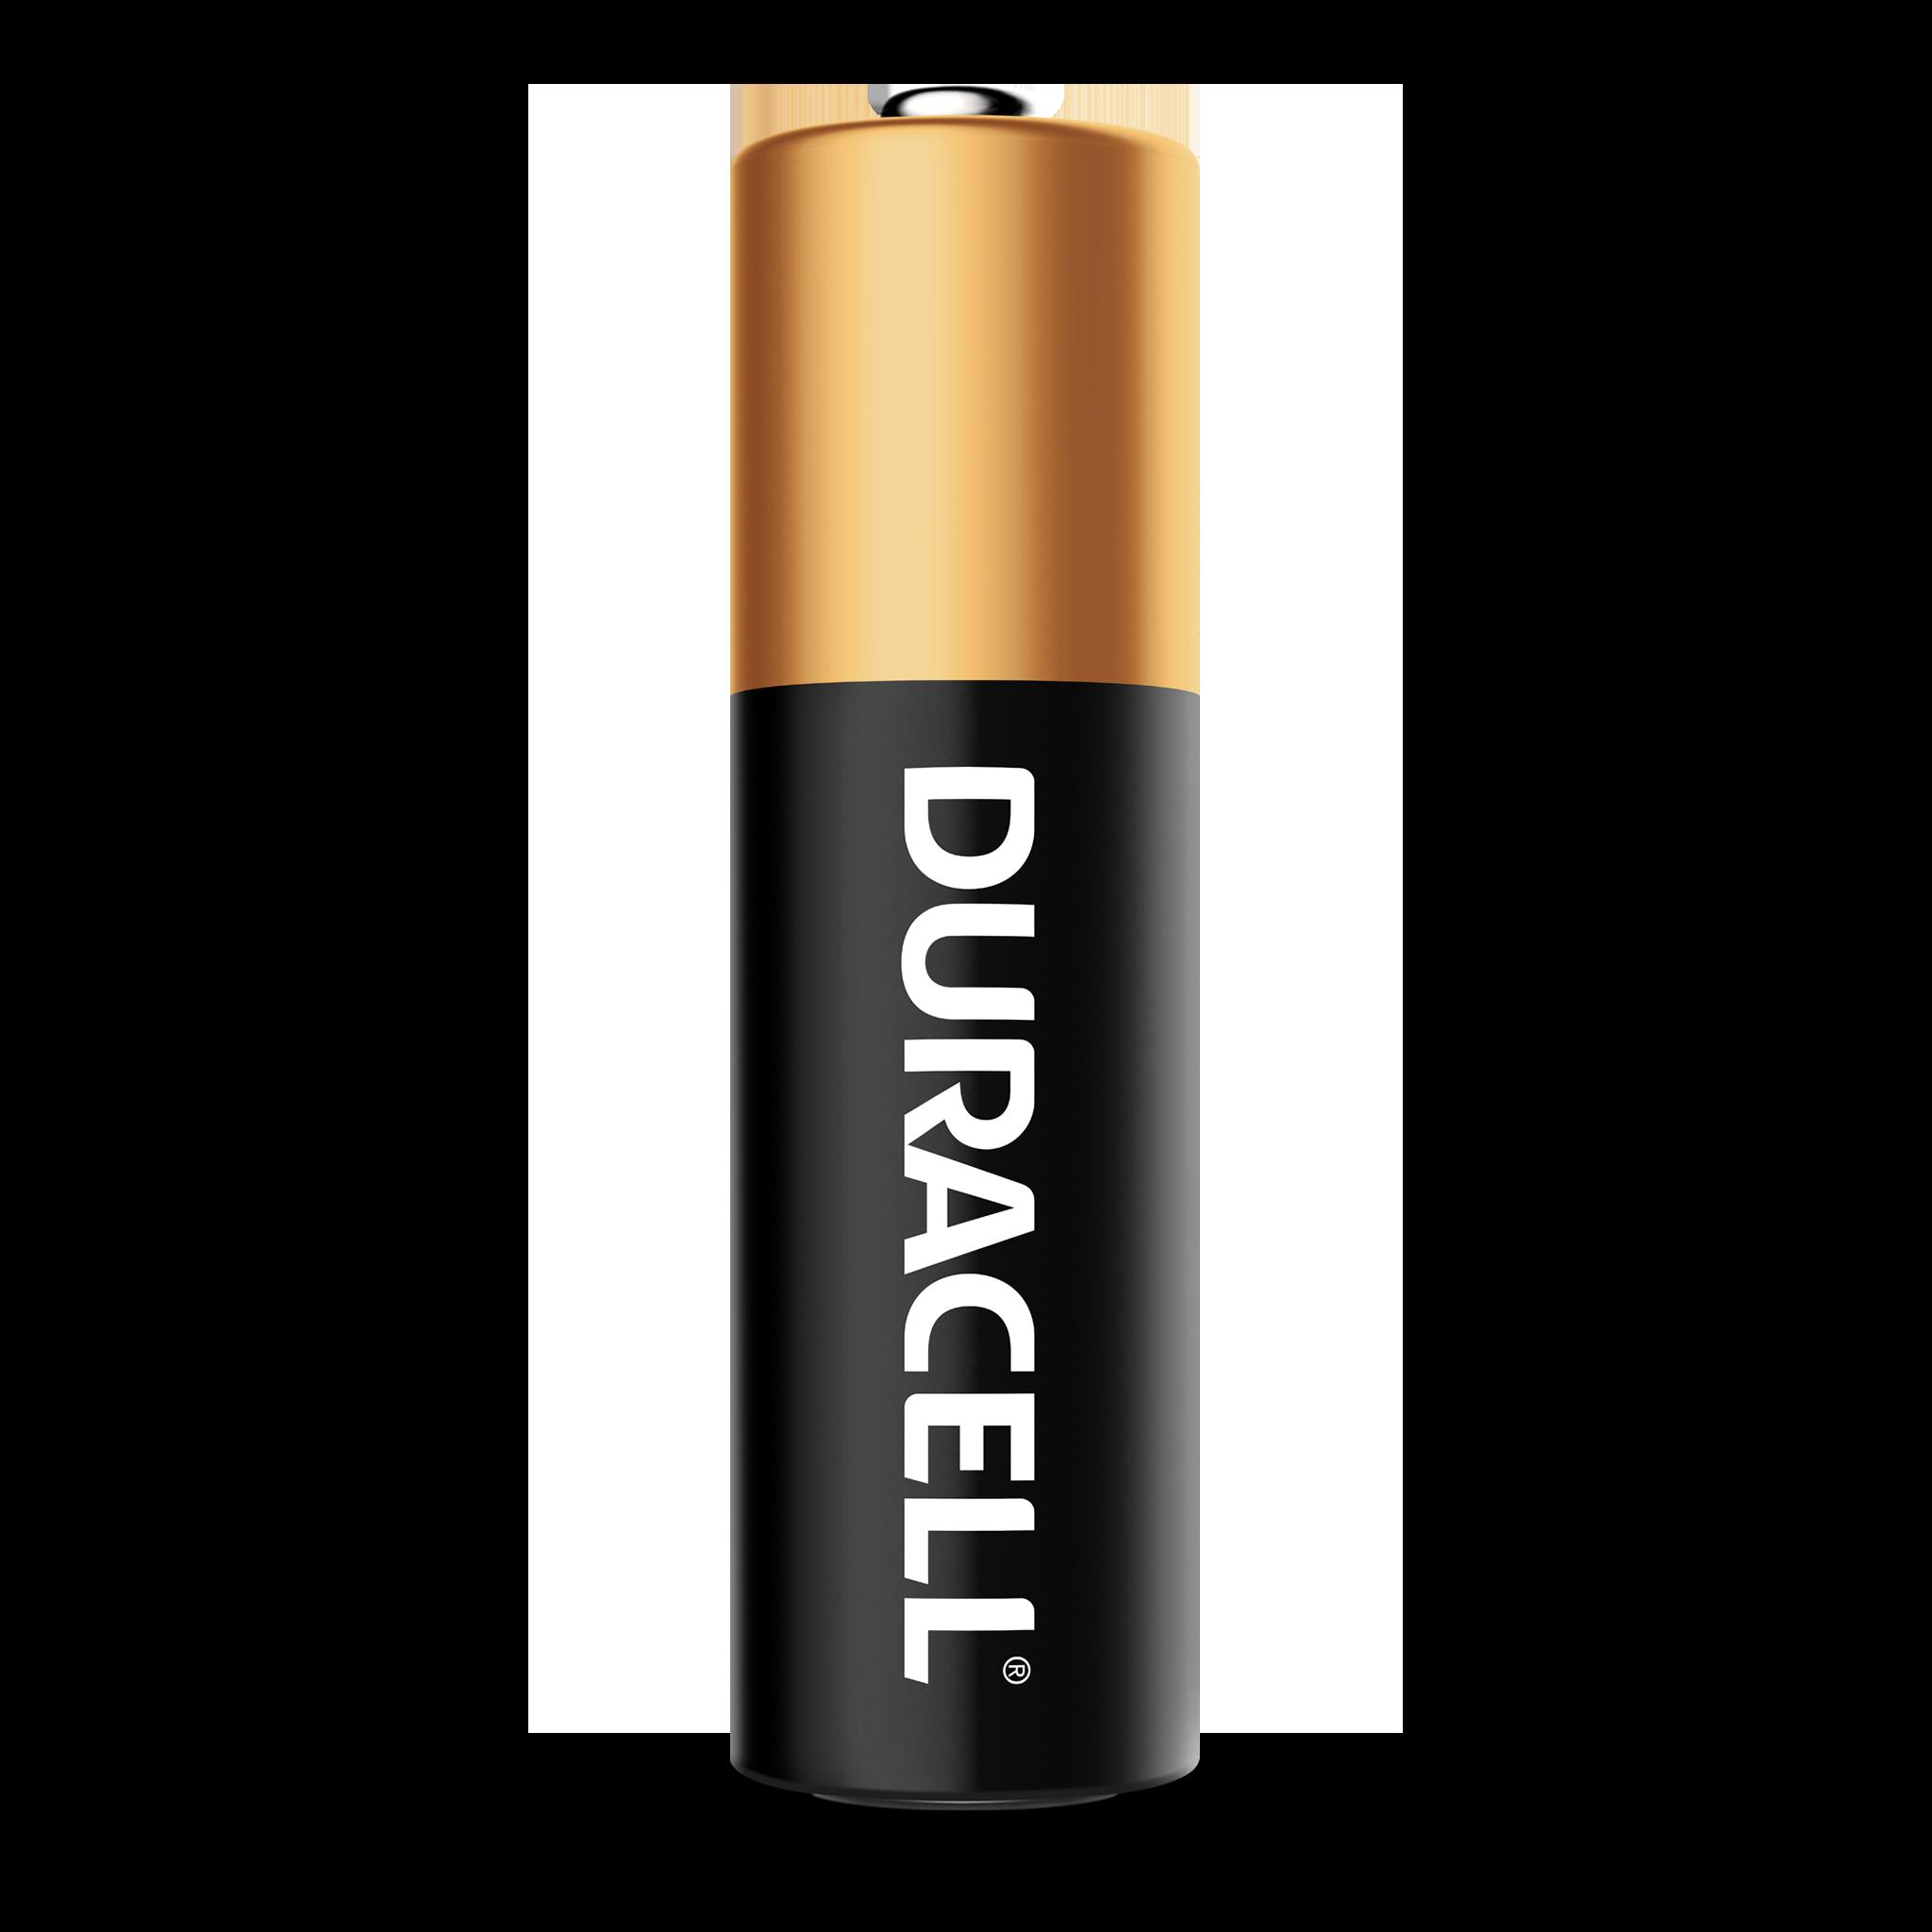 Standalone Coppertop AA battery